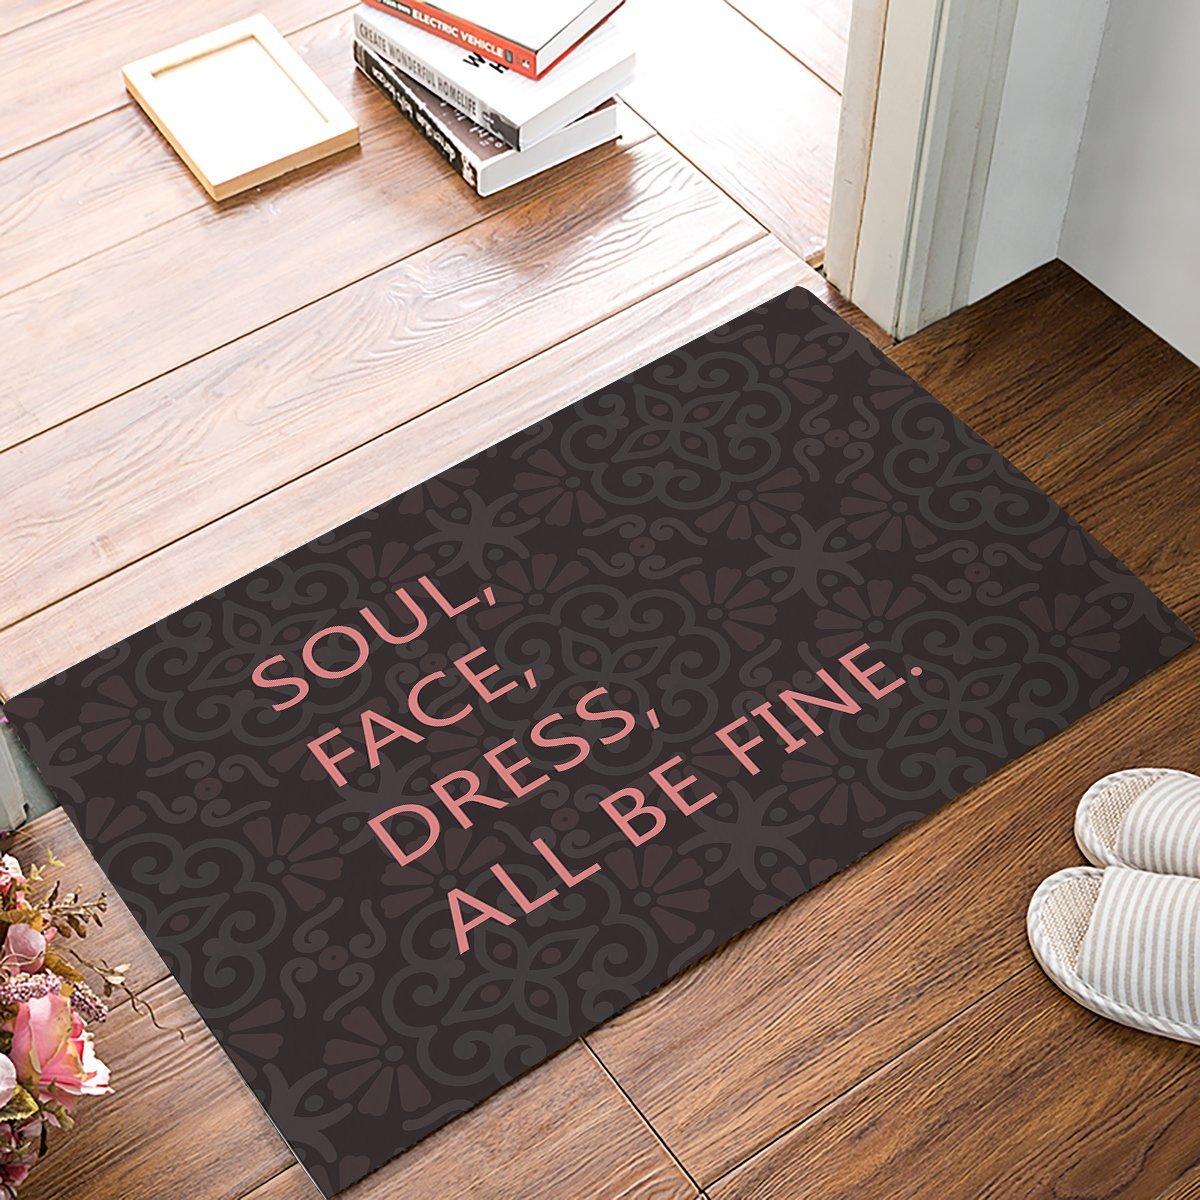 Soul, Face, Dress, All Be Fine - Vintage Retro Flower Brown Door Mats Kitchen Floor Bath Entrance Rug Mat